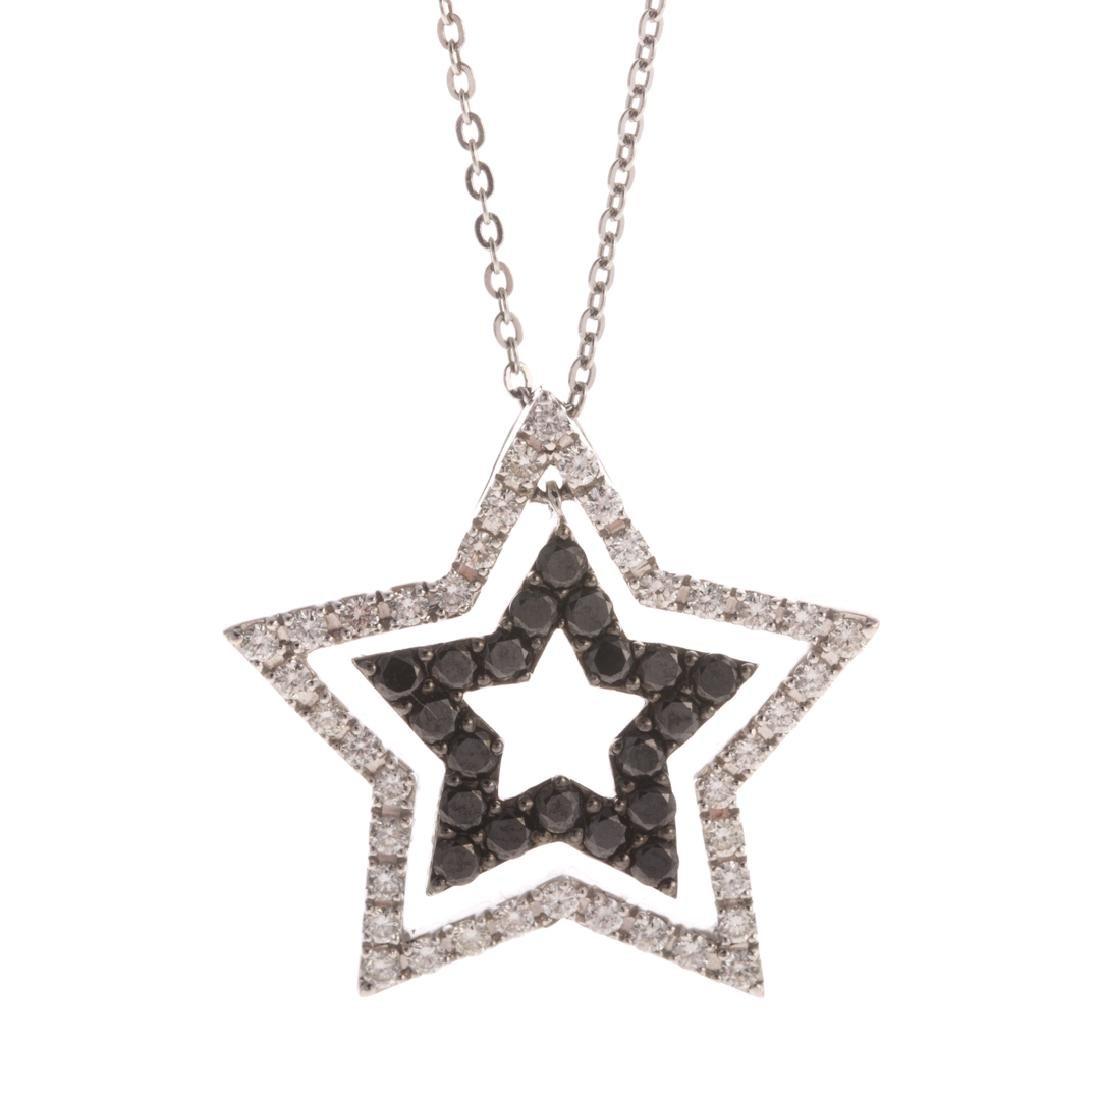 A Black & White Diamond Star Pendant